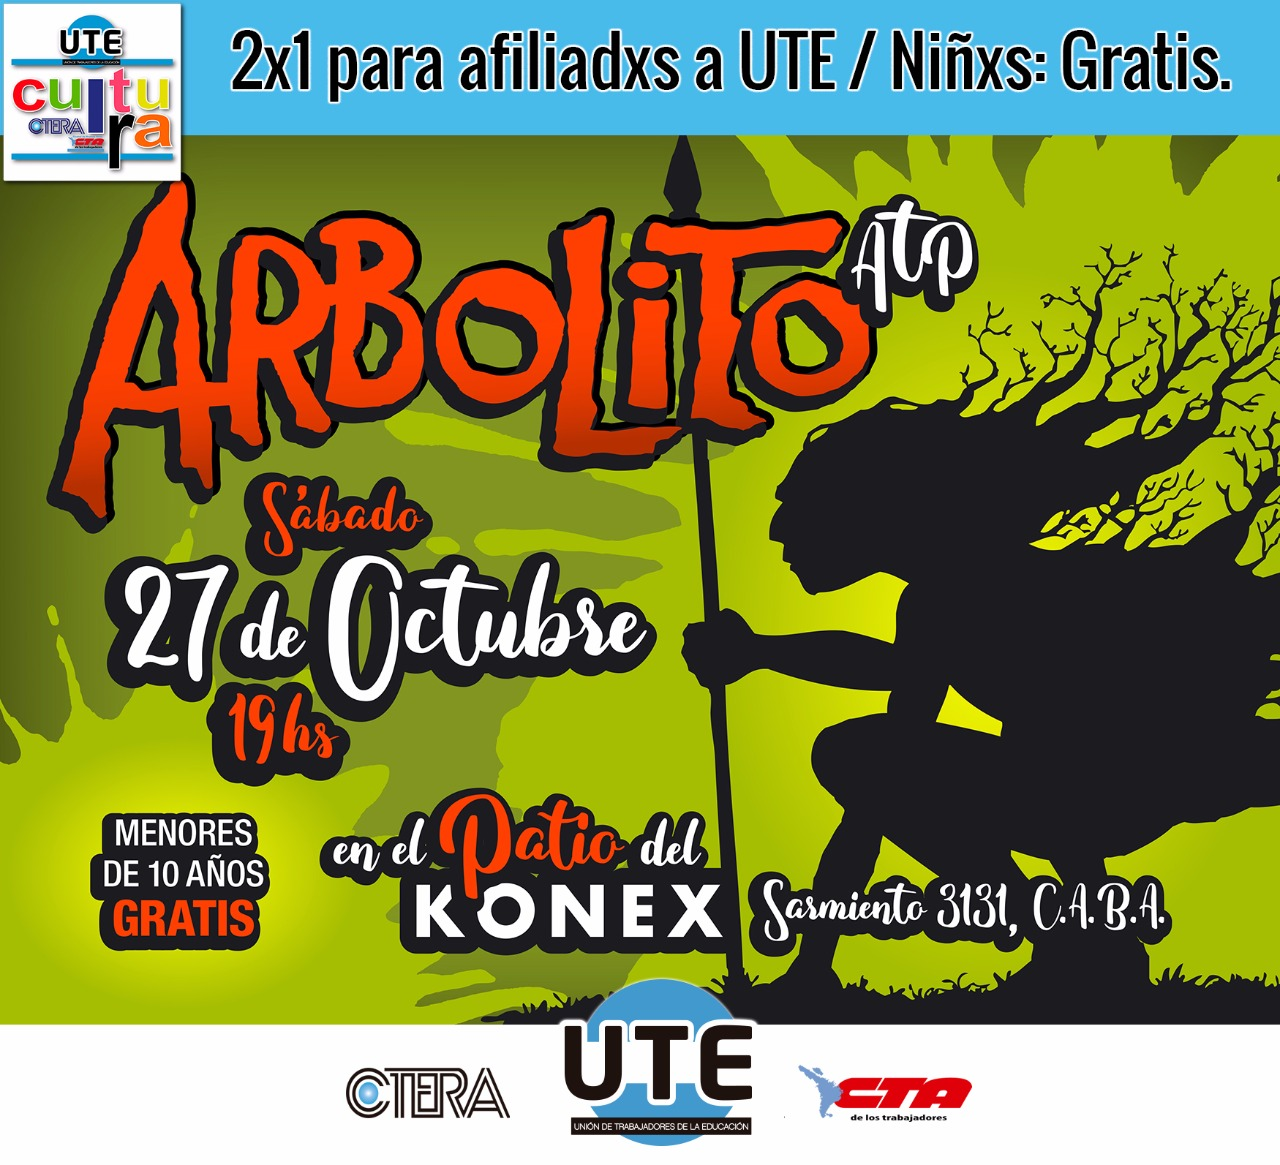 Arbolito en el Konex - 2x1 para afiliadxs - Niñxs gratis.